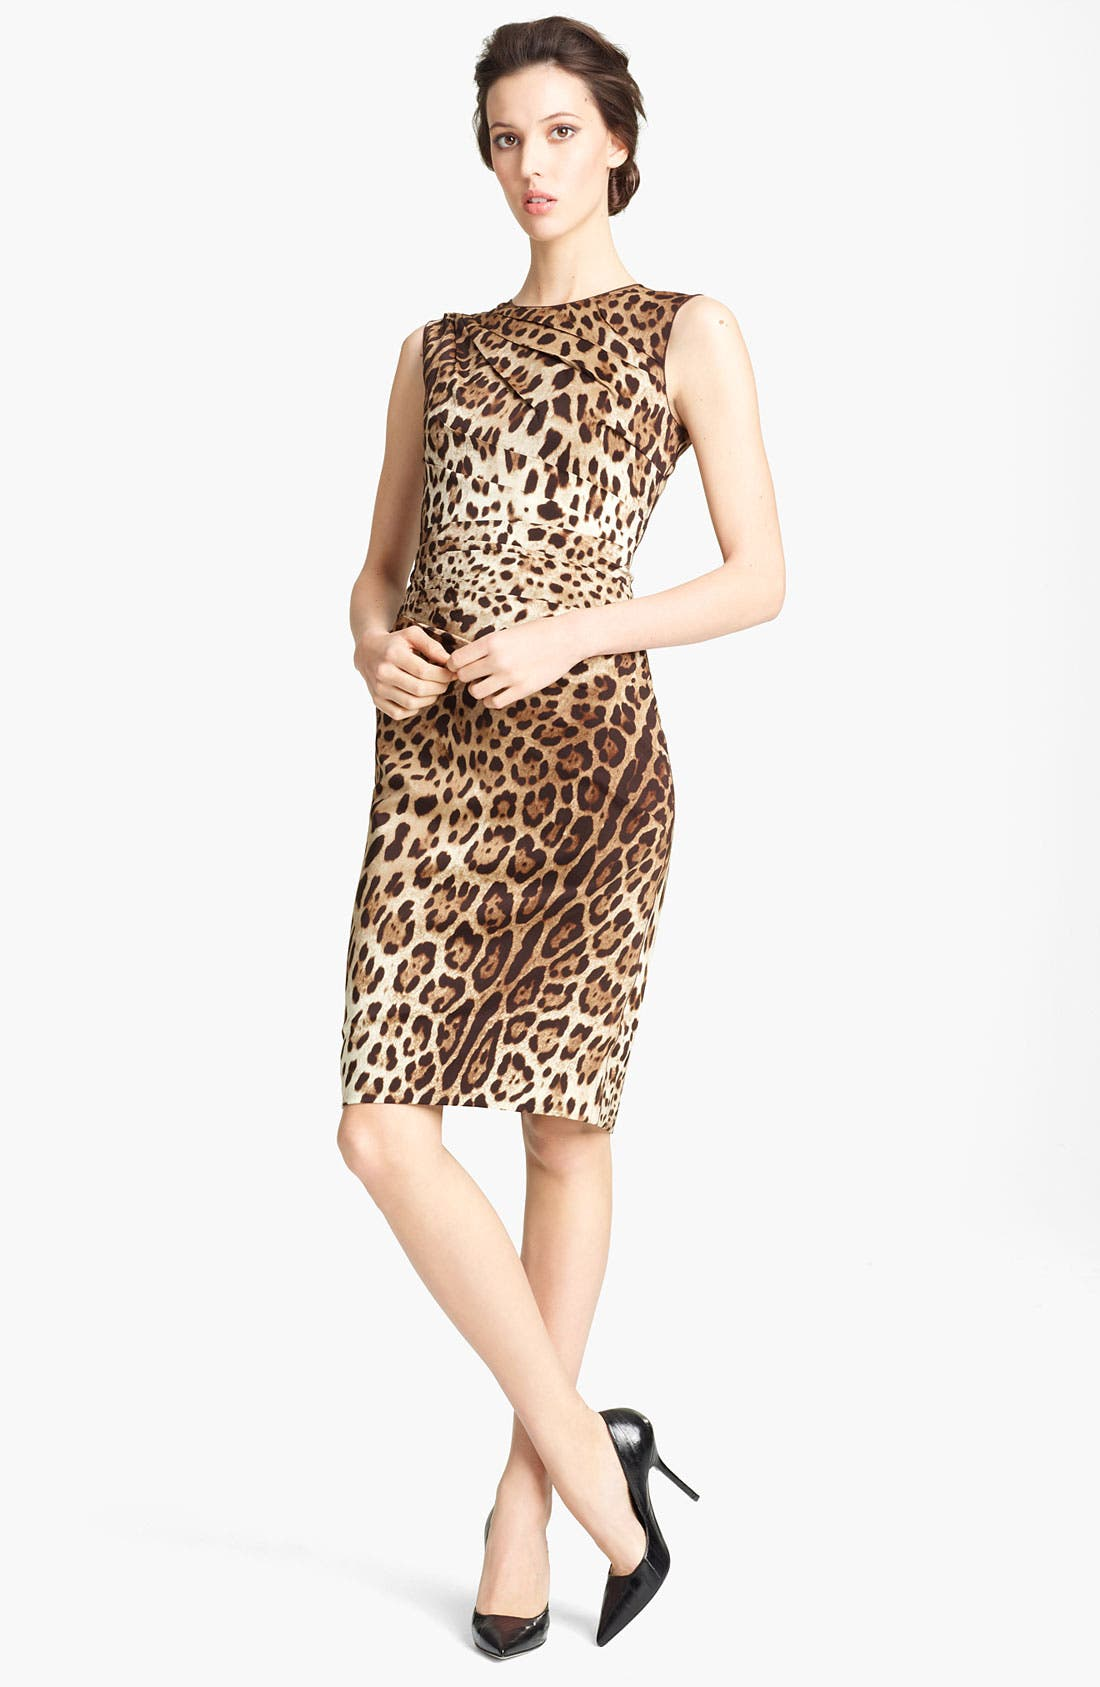 Alternate Image 1 Selected - Dolce&Gabbana Leopard Print Stretch Silk Dress